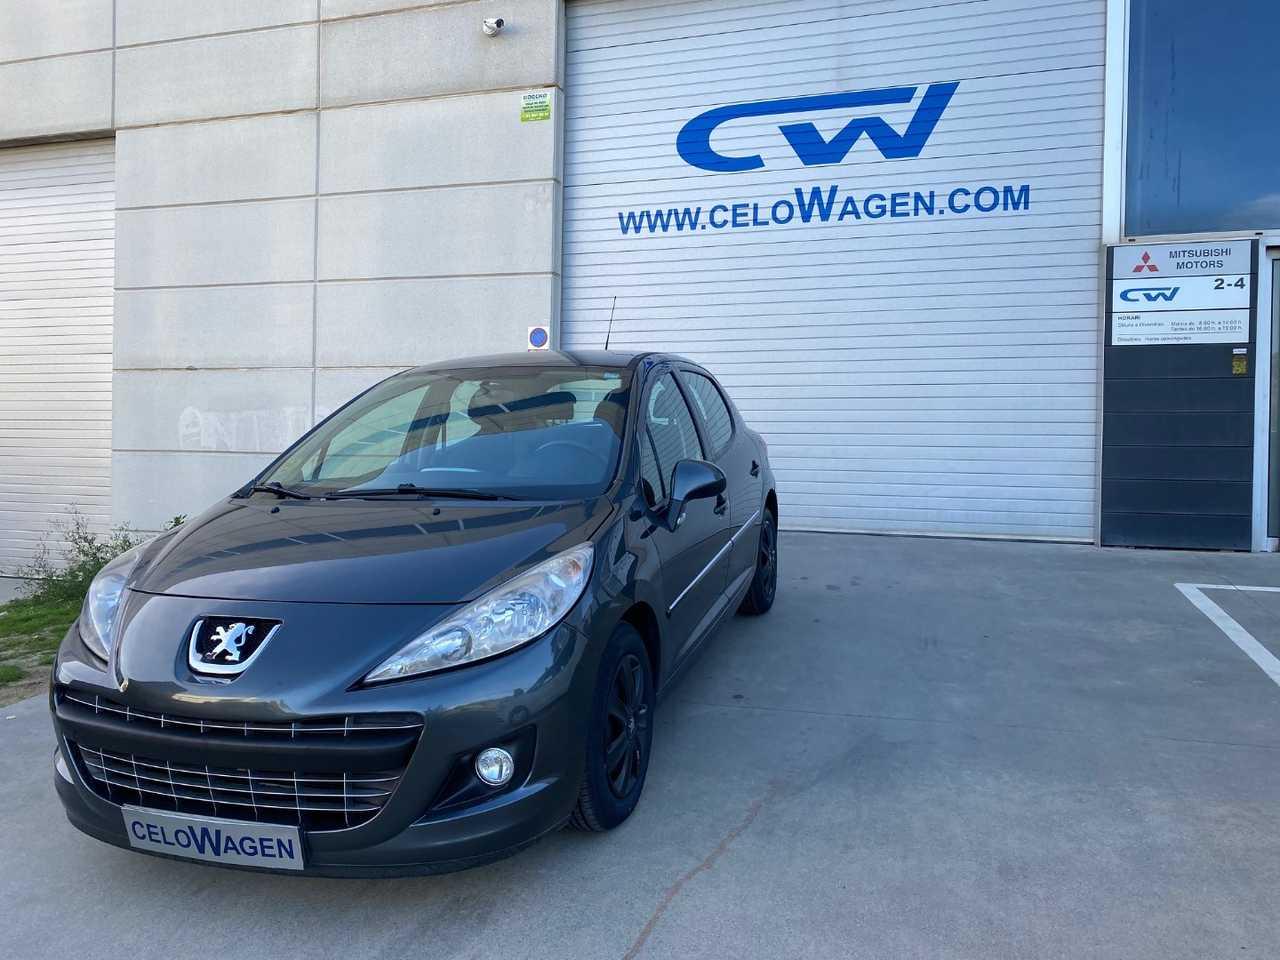 Peugeot 207 ACTIVE 1.4 HDI 70 FAP 5p.   - Foto 1